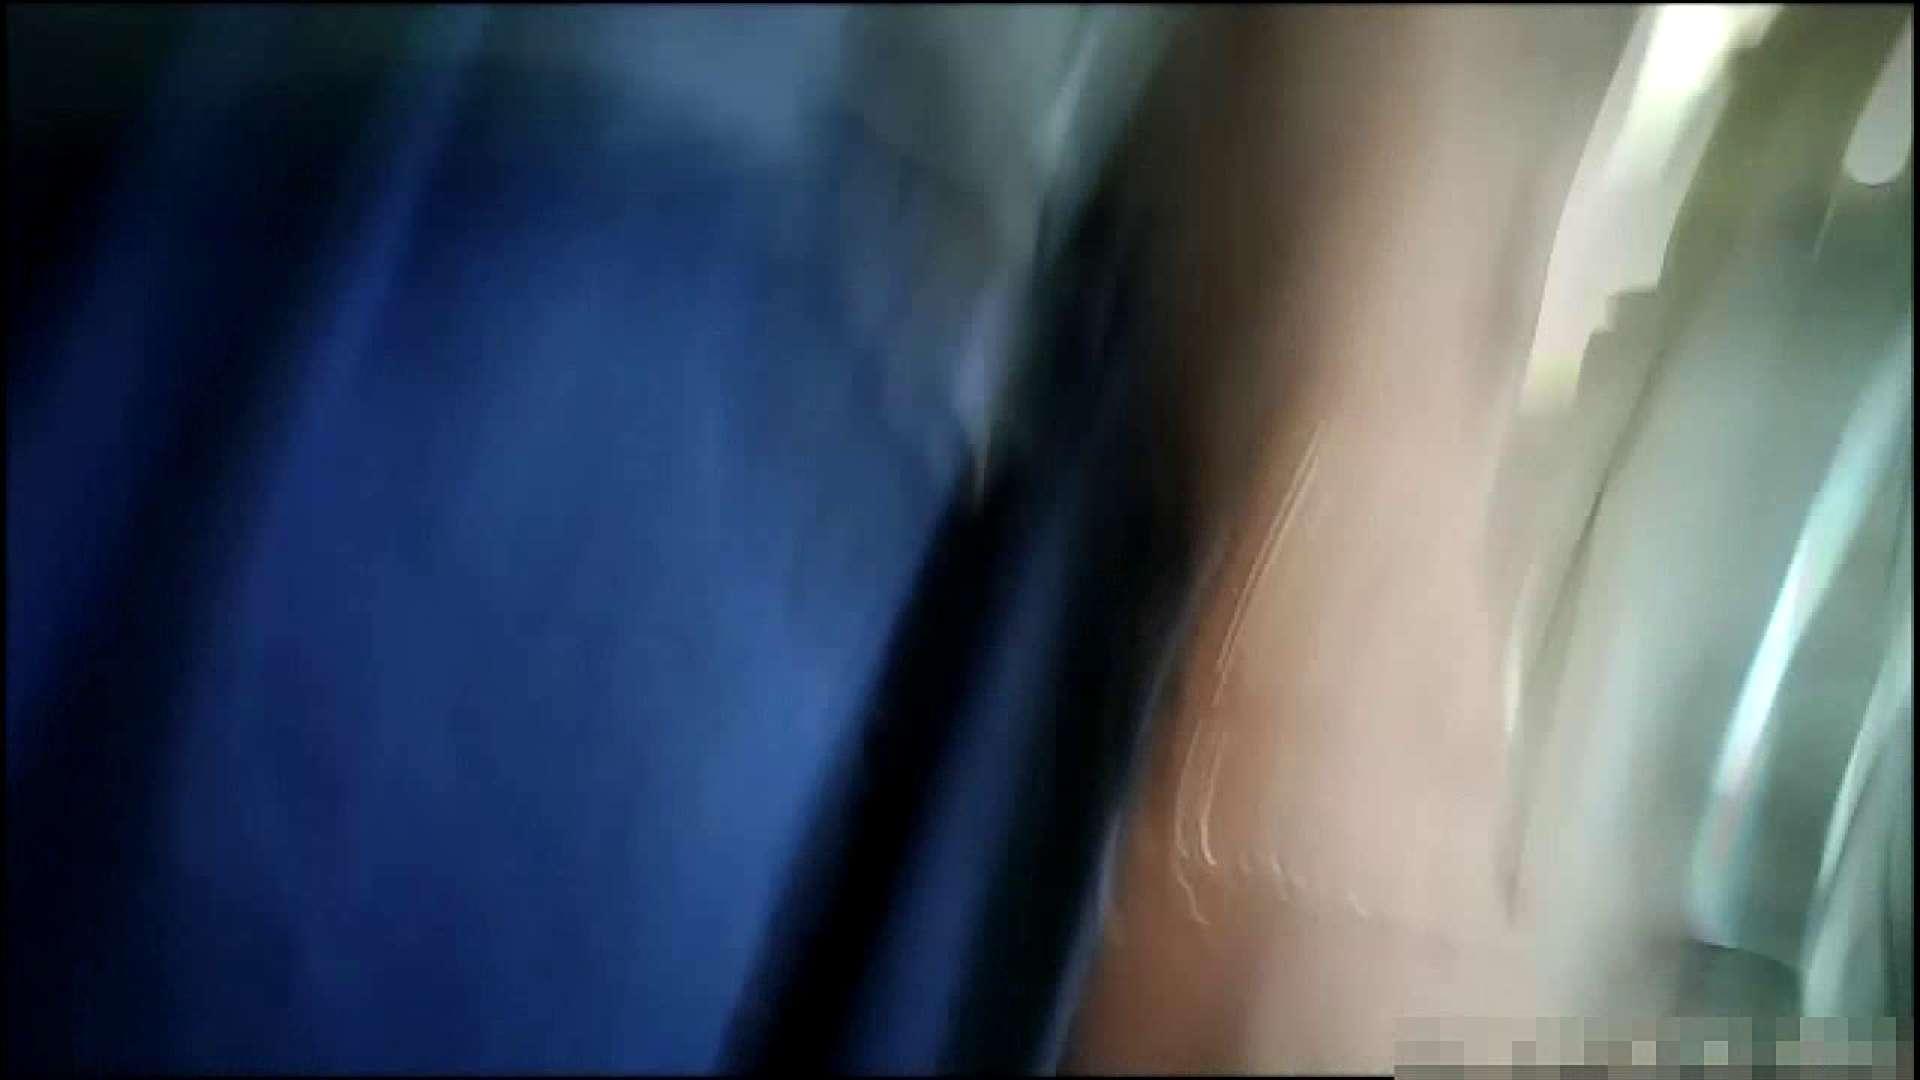 NO.3 友人間の情報で「処女」が確定している友達【某有名雑貨店】 チラ   胸チラ  96pic 1